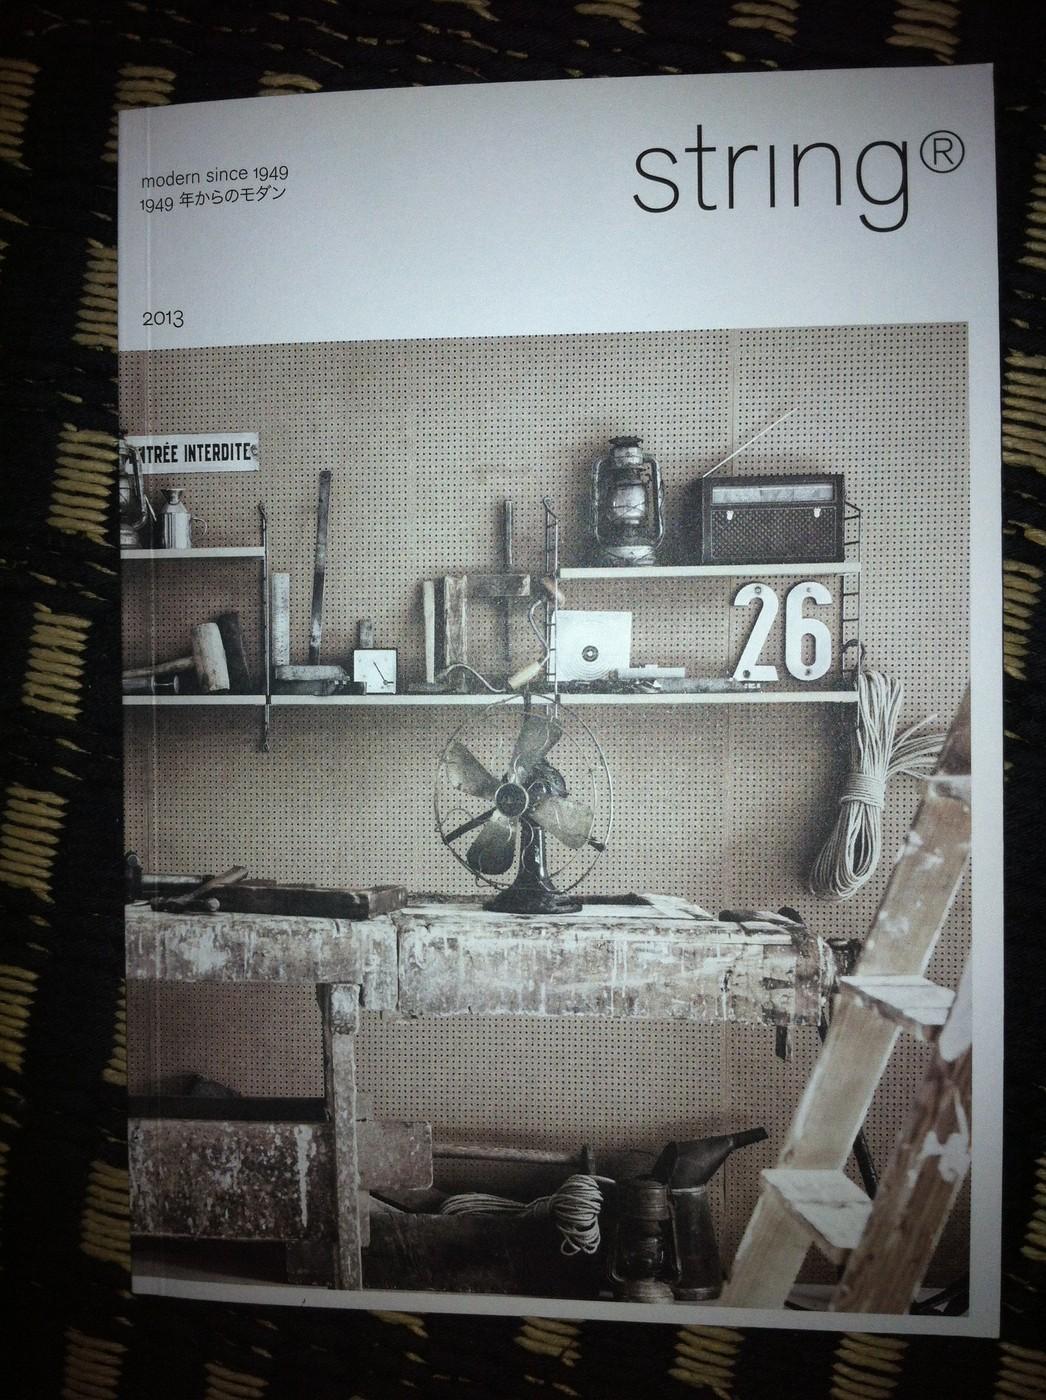 String_kuvasto.jpg